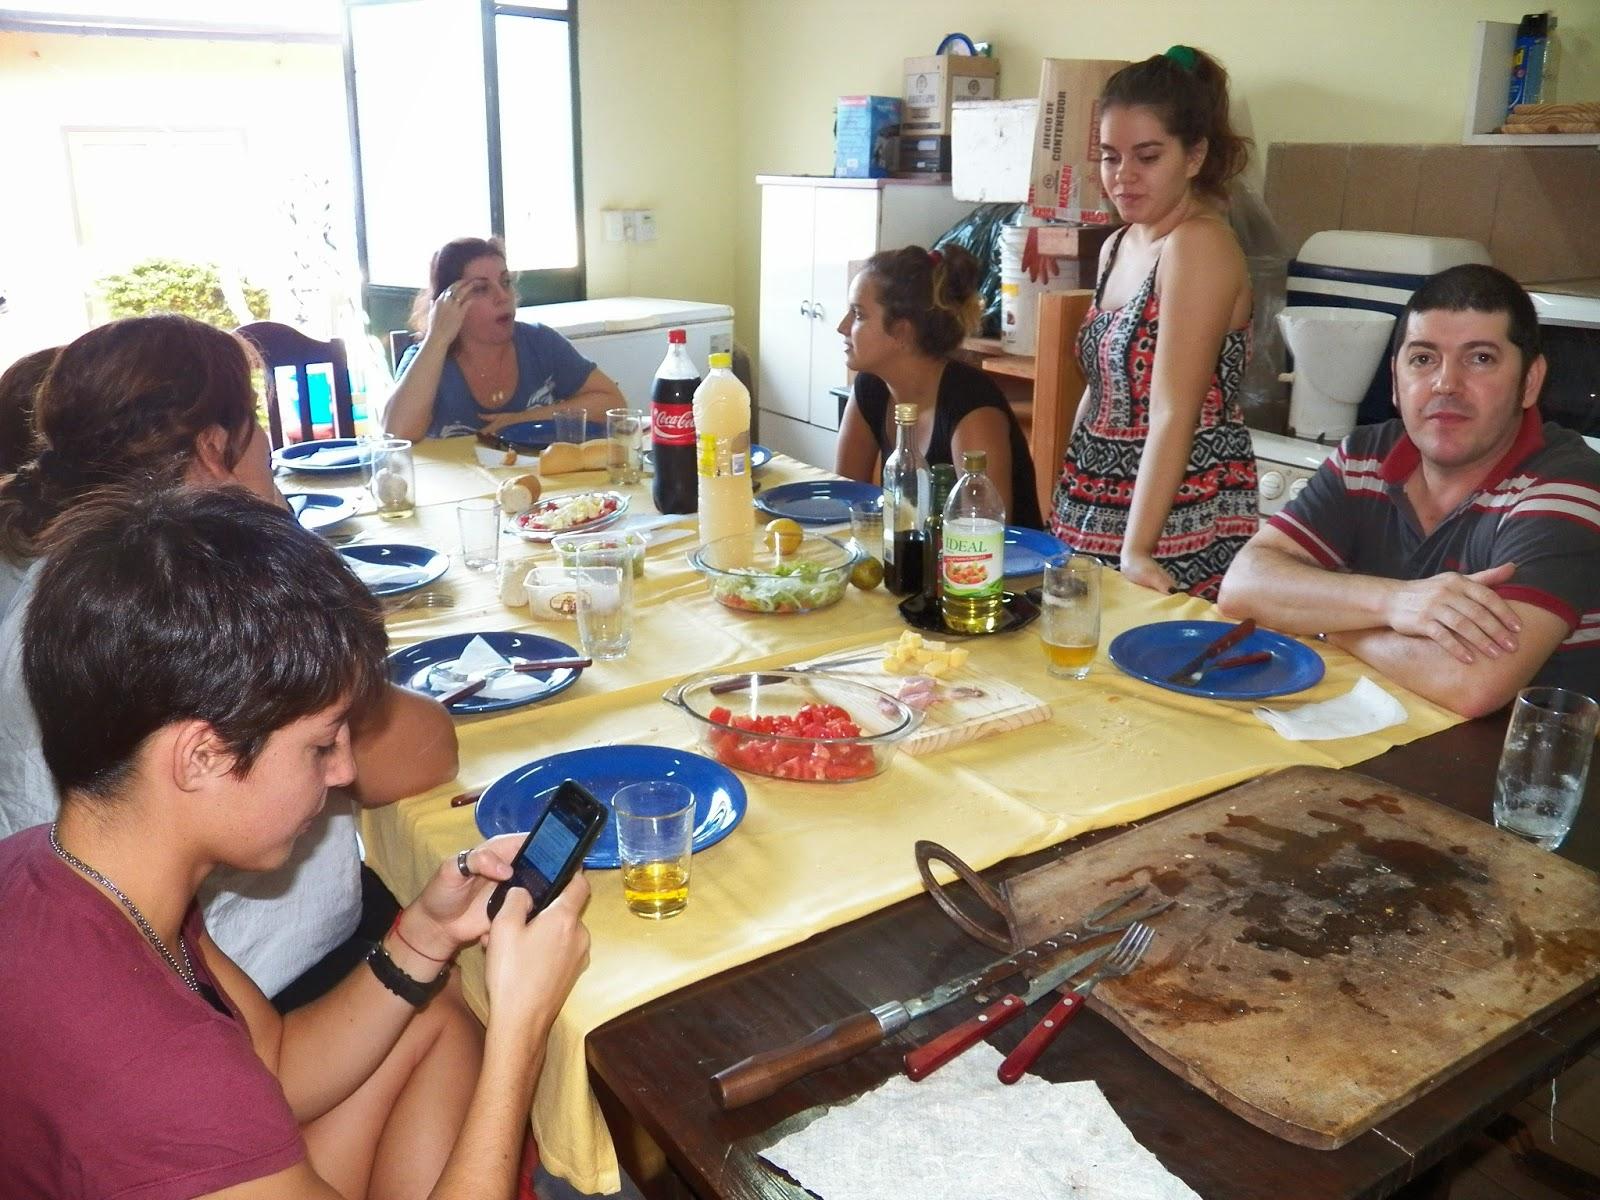 voyage argentine 2013 2014 rotary youth exchange repas en famille. Black Bedroom Furniture Sets. Home Design Ideas